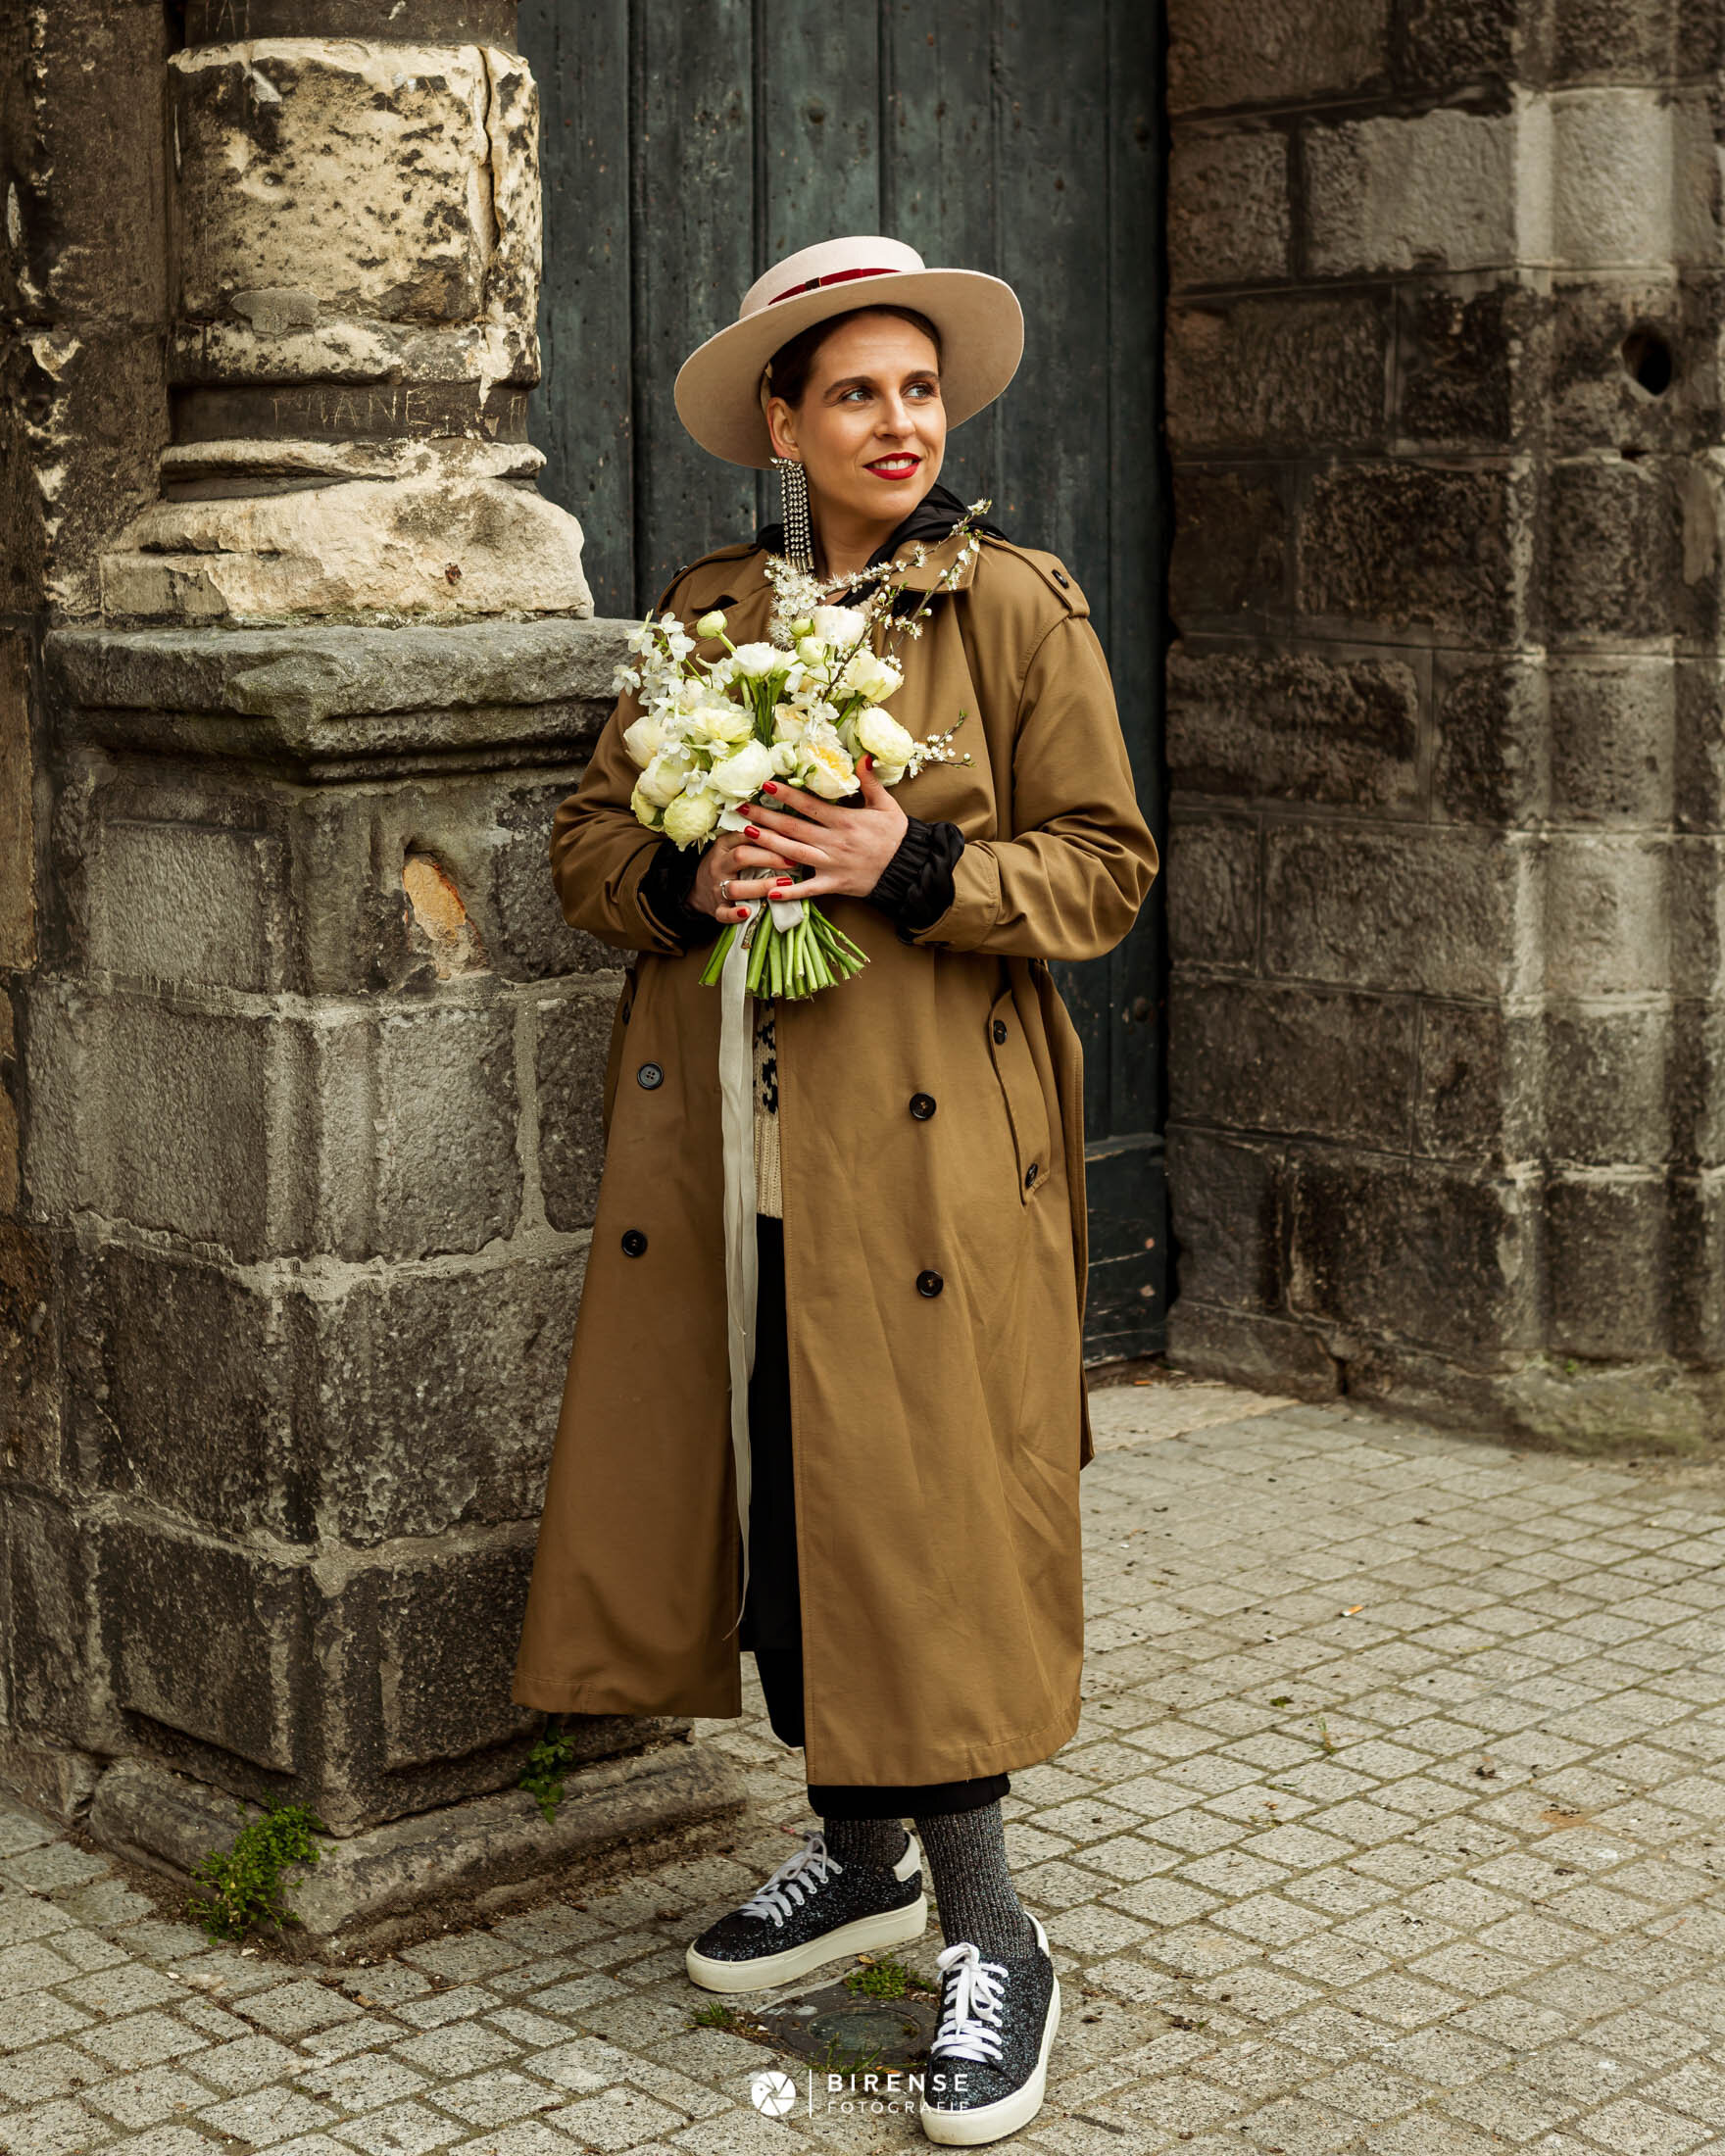 Brandingshoot Lifestyle portret by Birense Fotografie-7.jpg